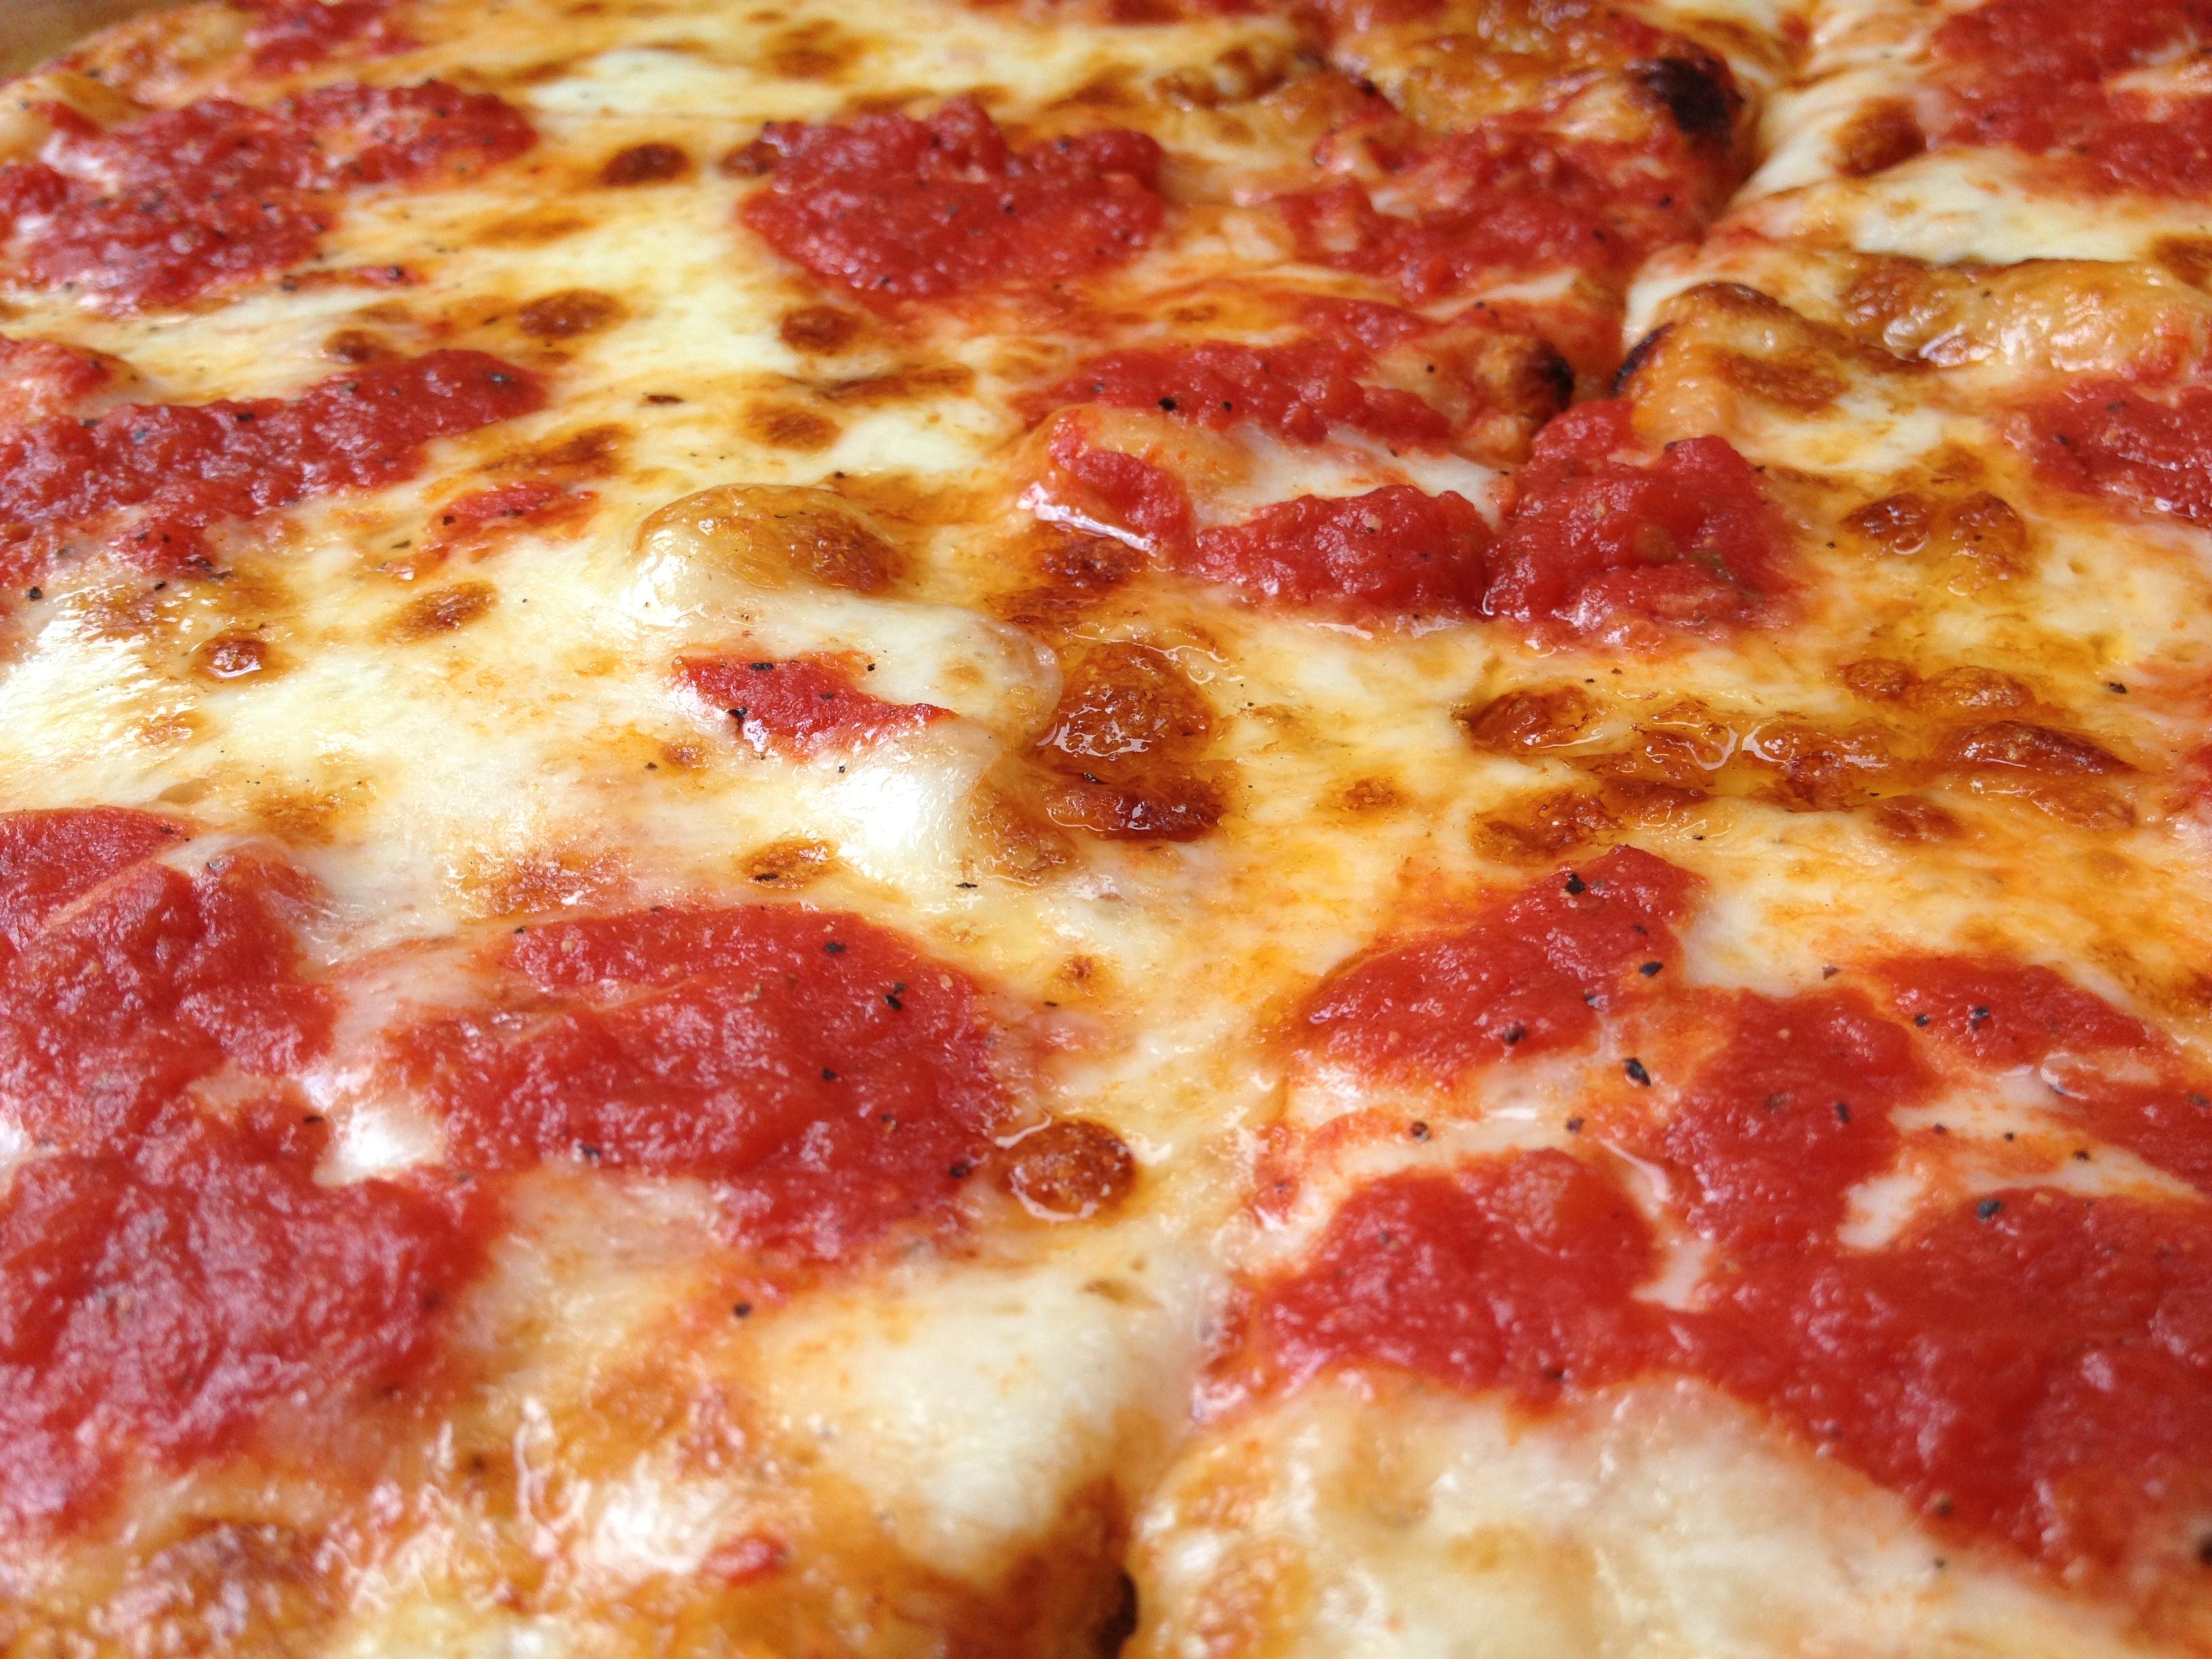 Anthony's Coal Fired Pizza - Wayne, PA - Keystone Pizza Critic